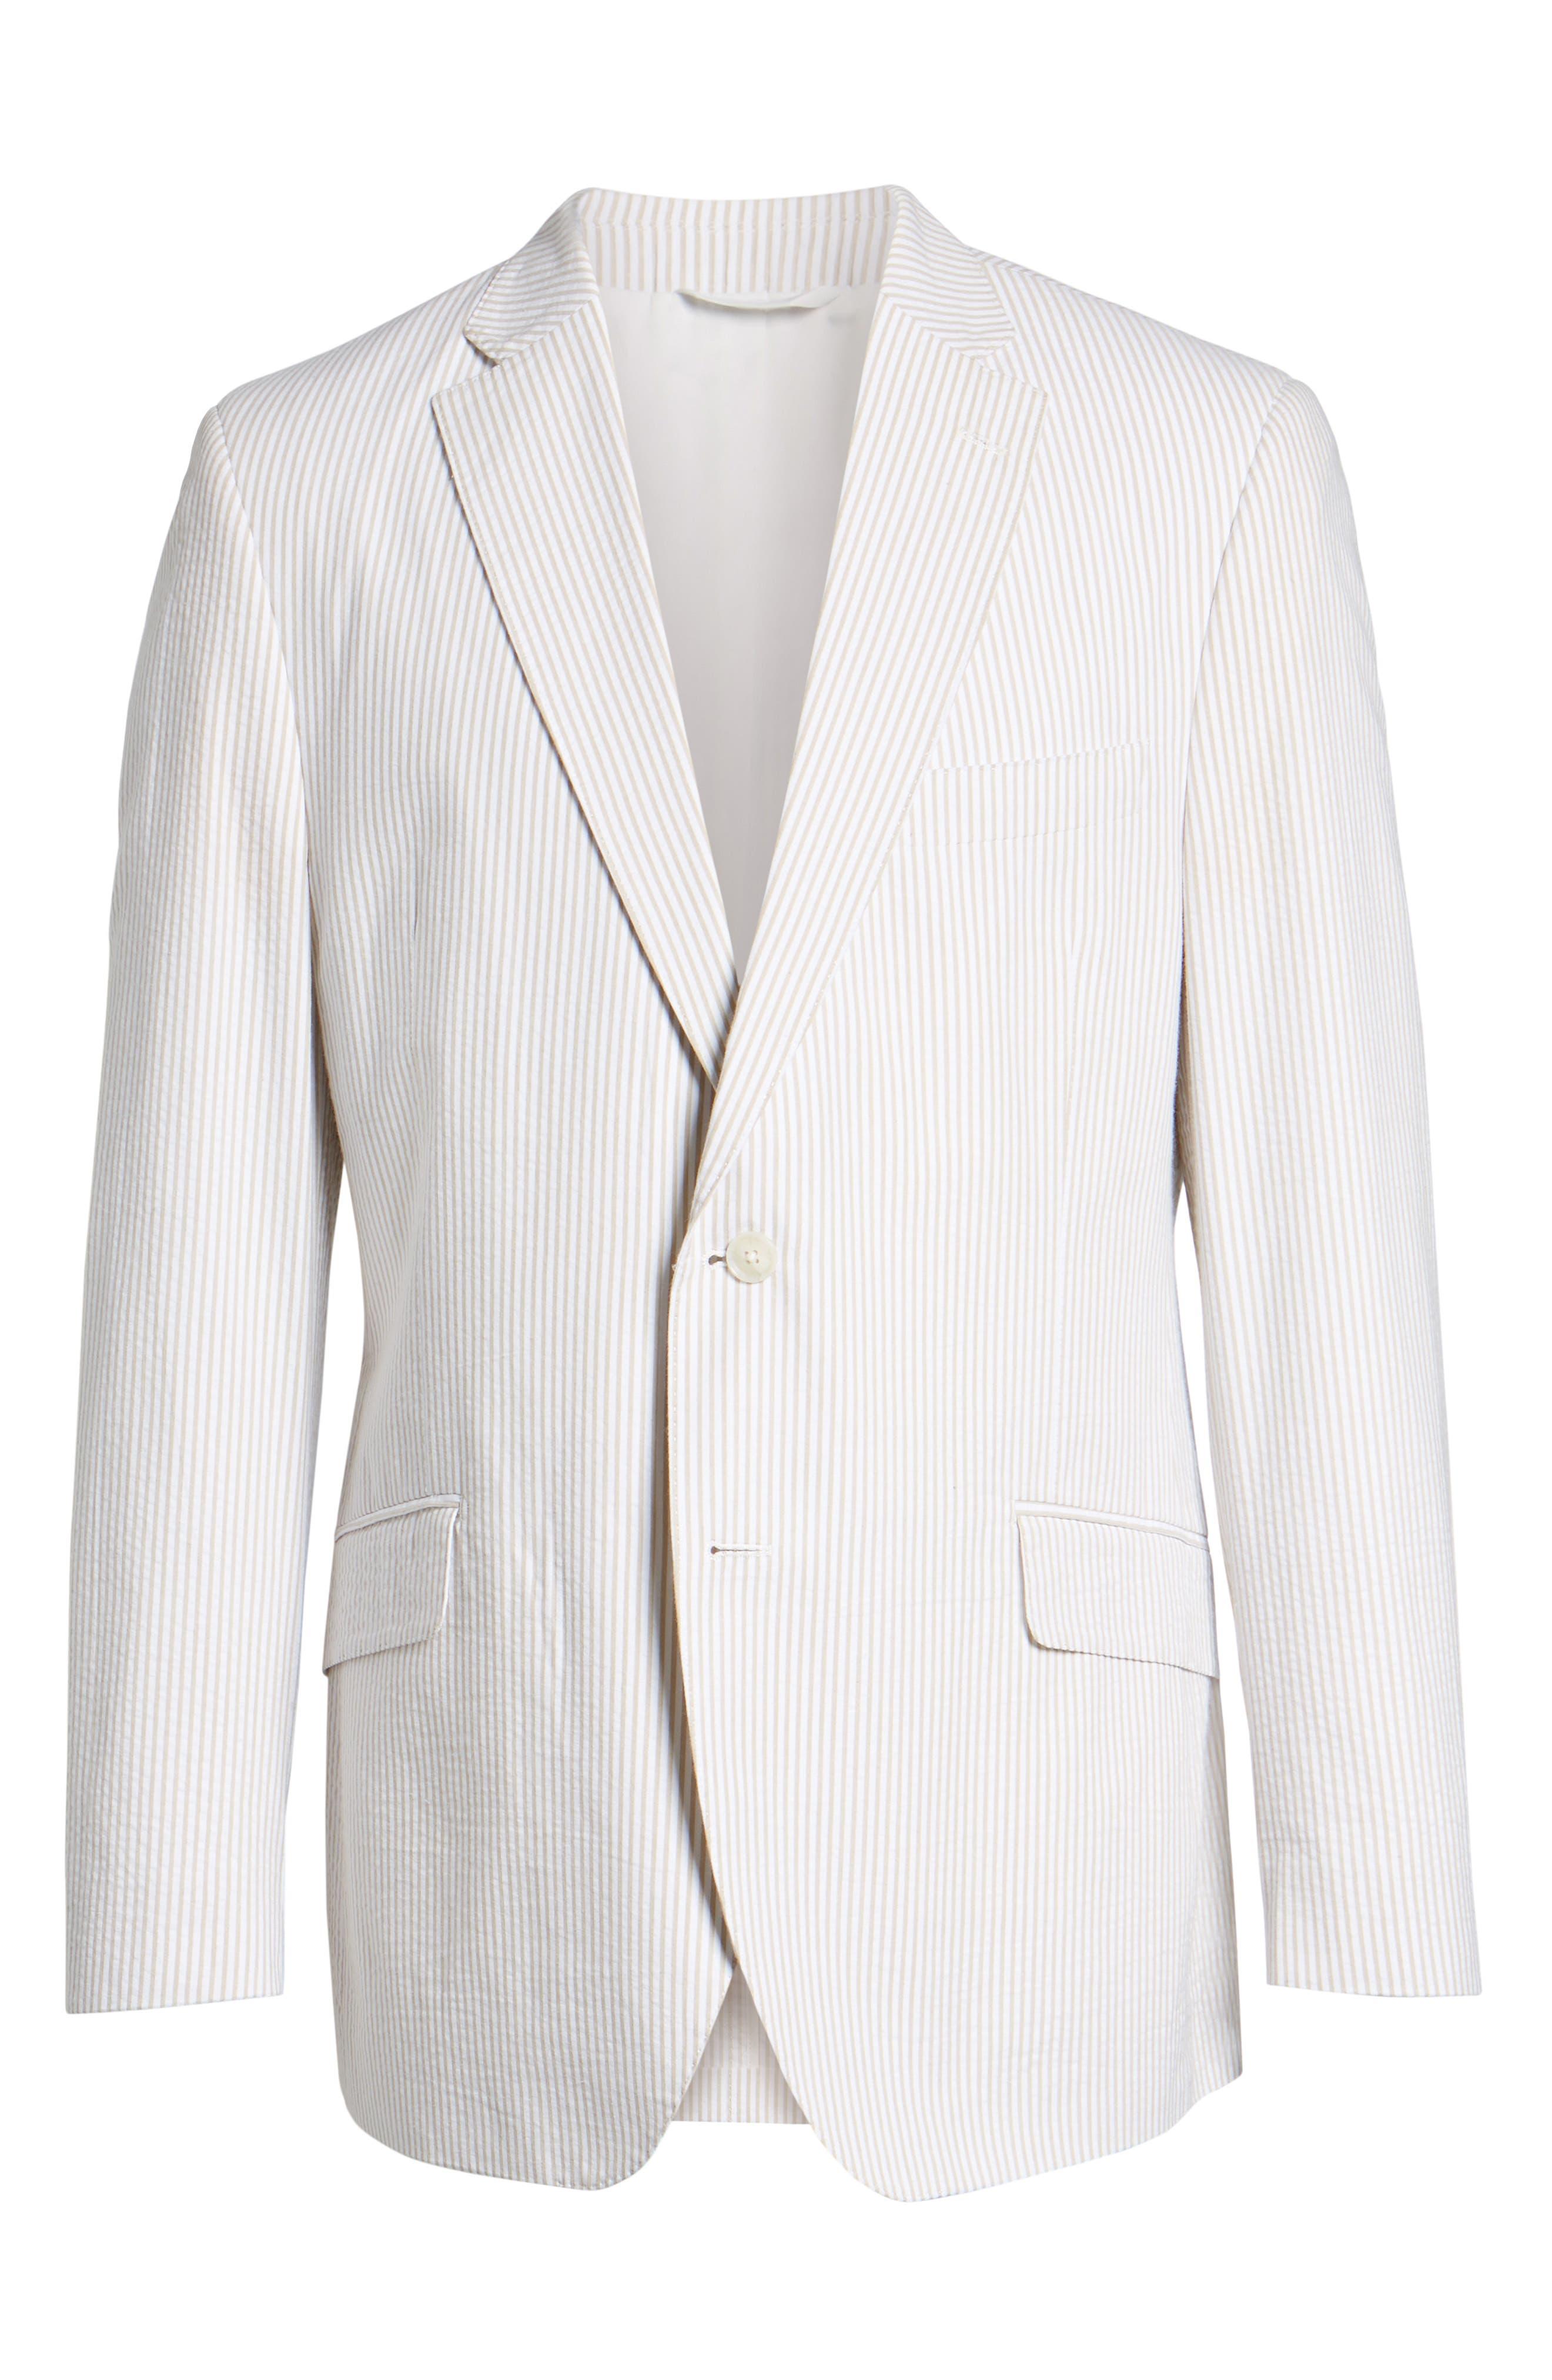 Jack AIM Classic Fit Seersucker Sport Coat,                             Alternate thumbnail 6, color,                             Tan And White